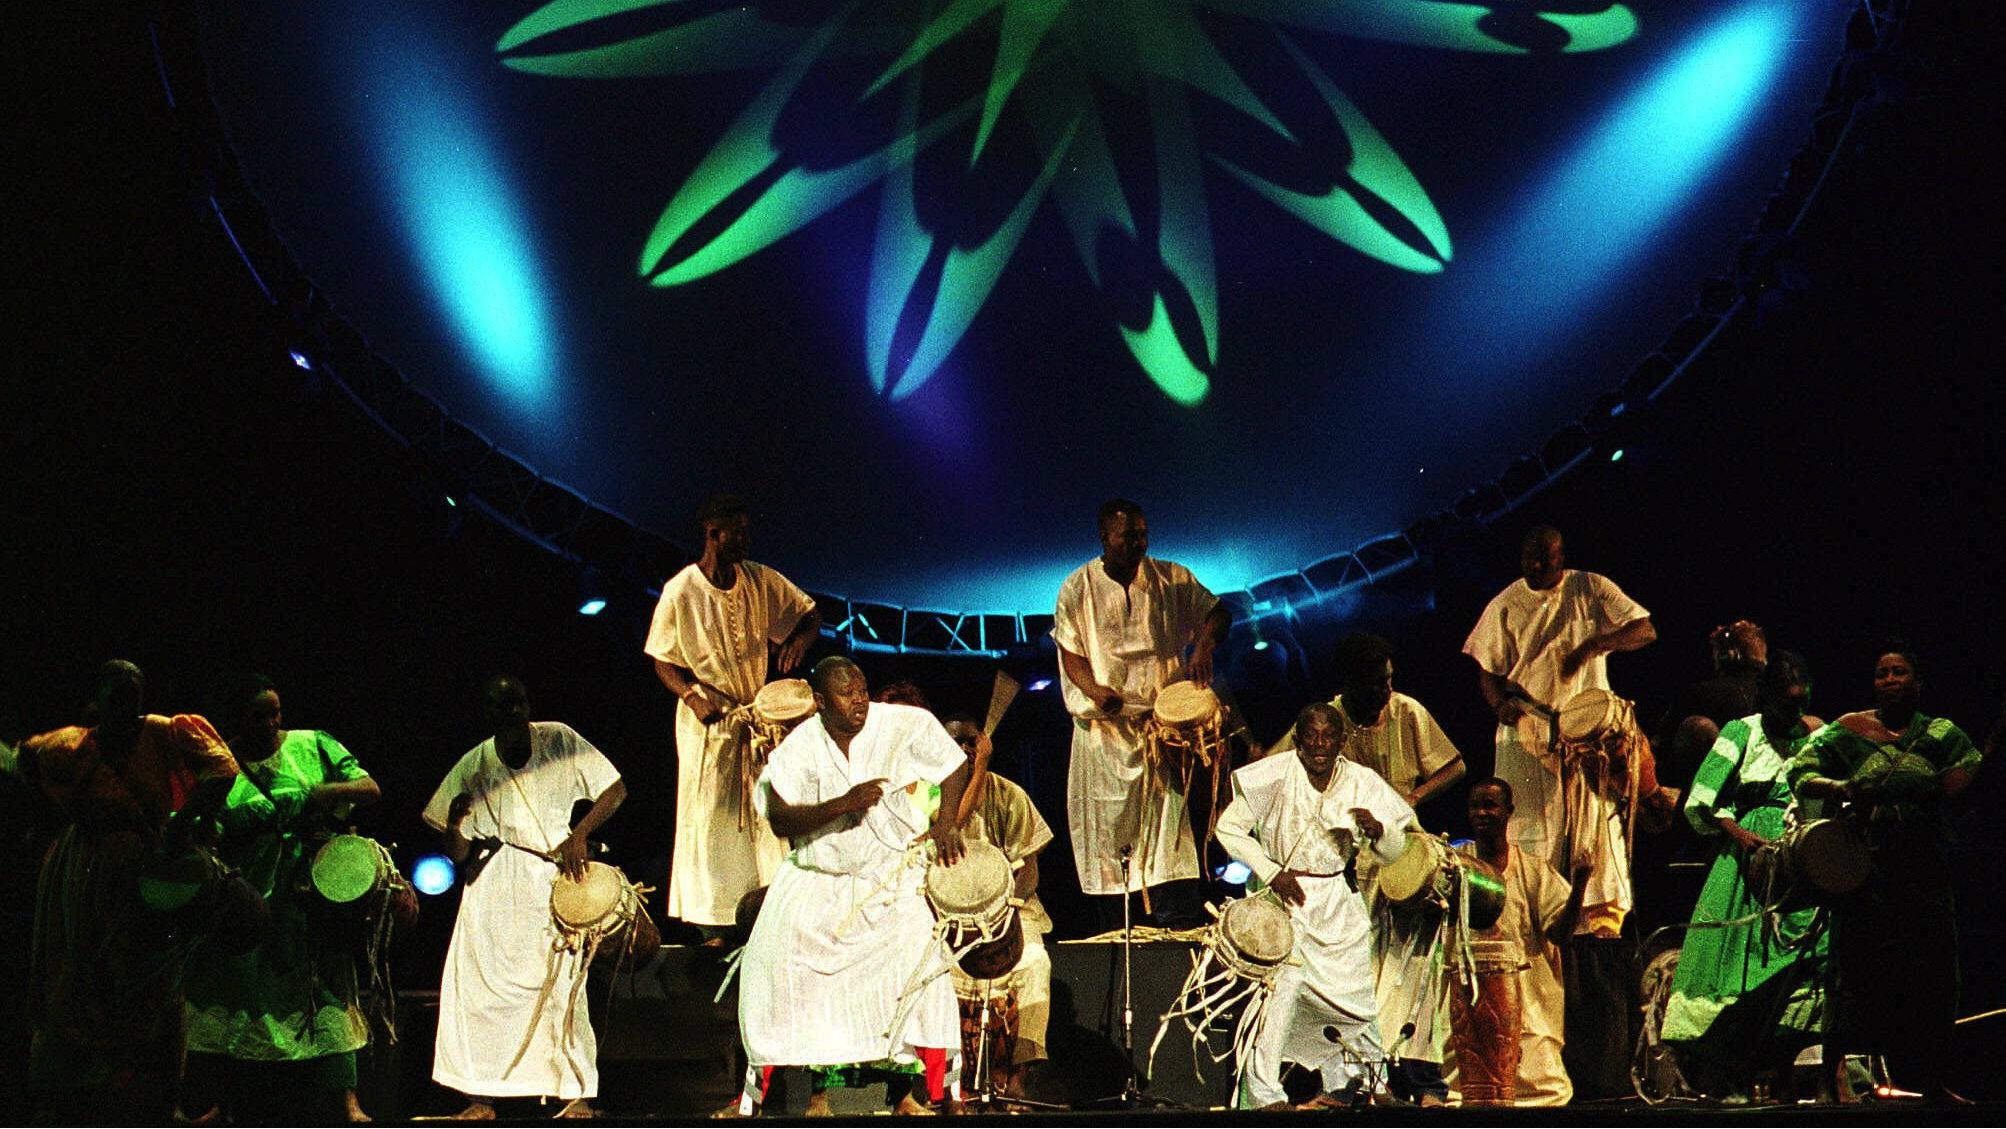 Doudou N'diaye Rose, Senegal's master drummer, has died.